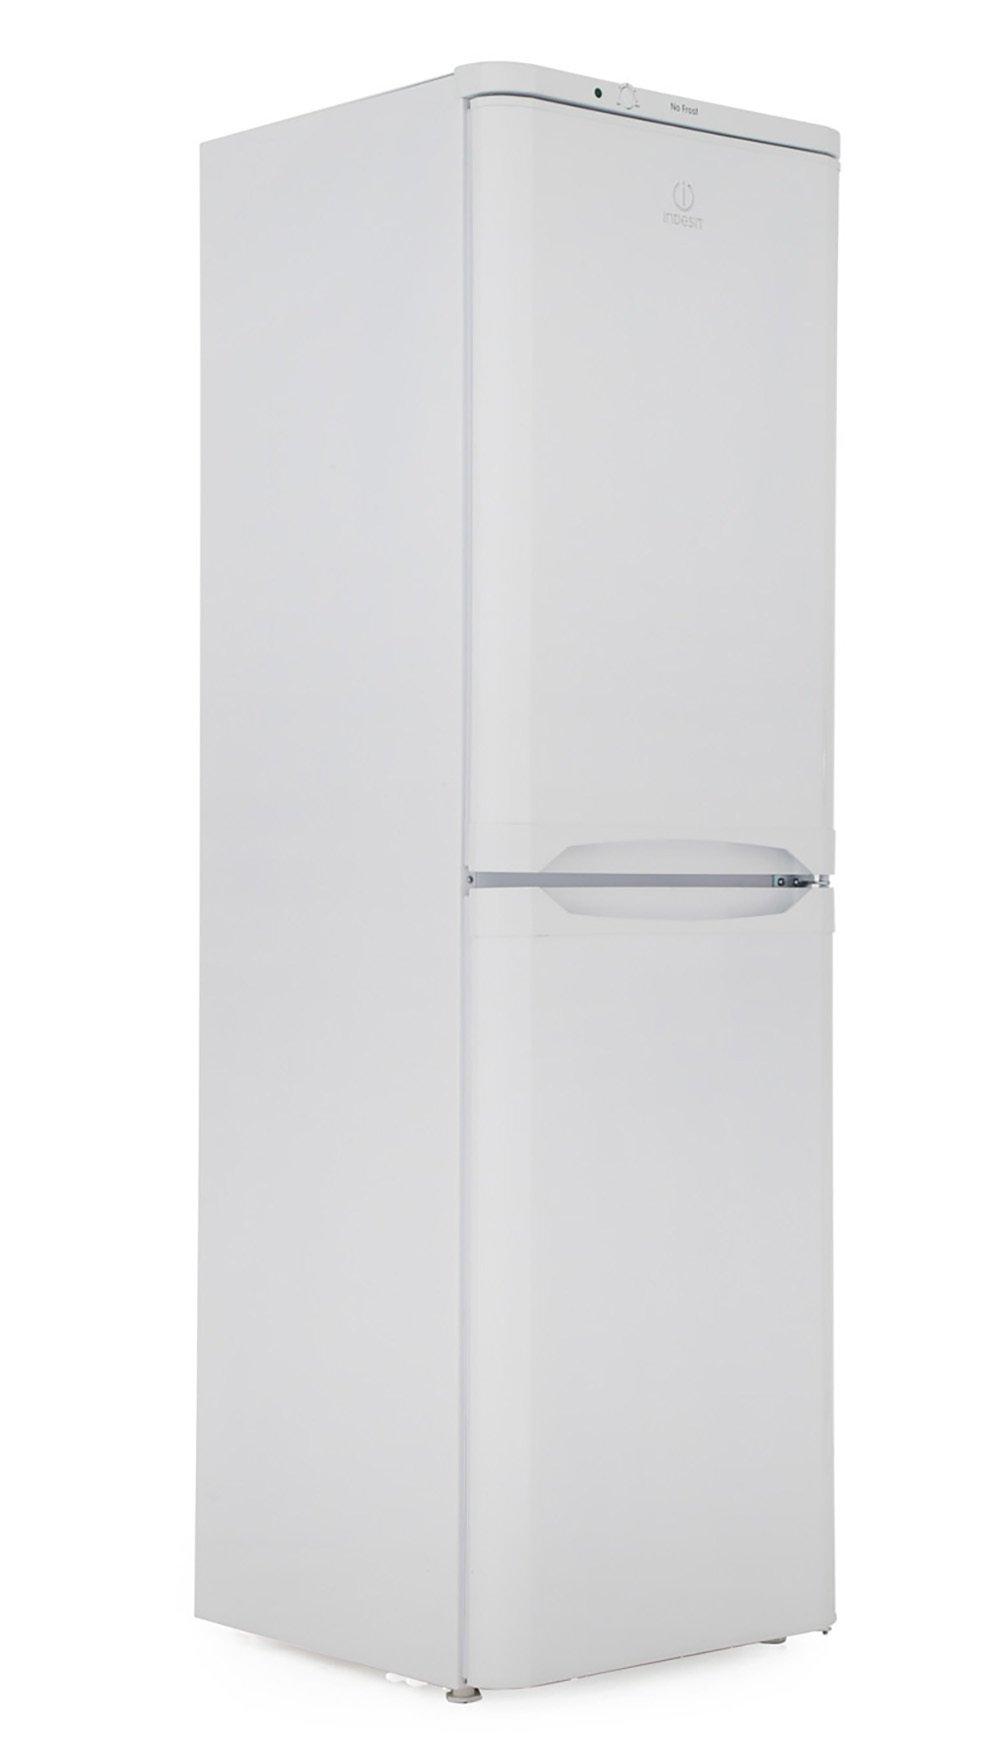 Indesit IBNF5517W Frost Free Fridge Freezer